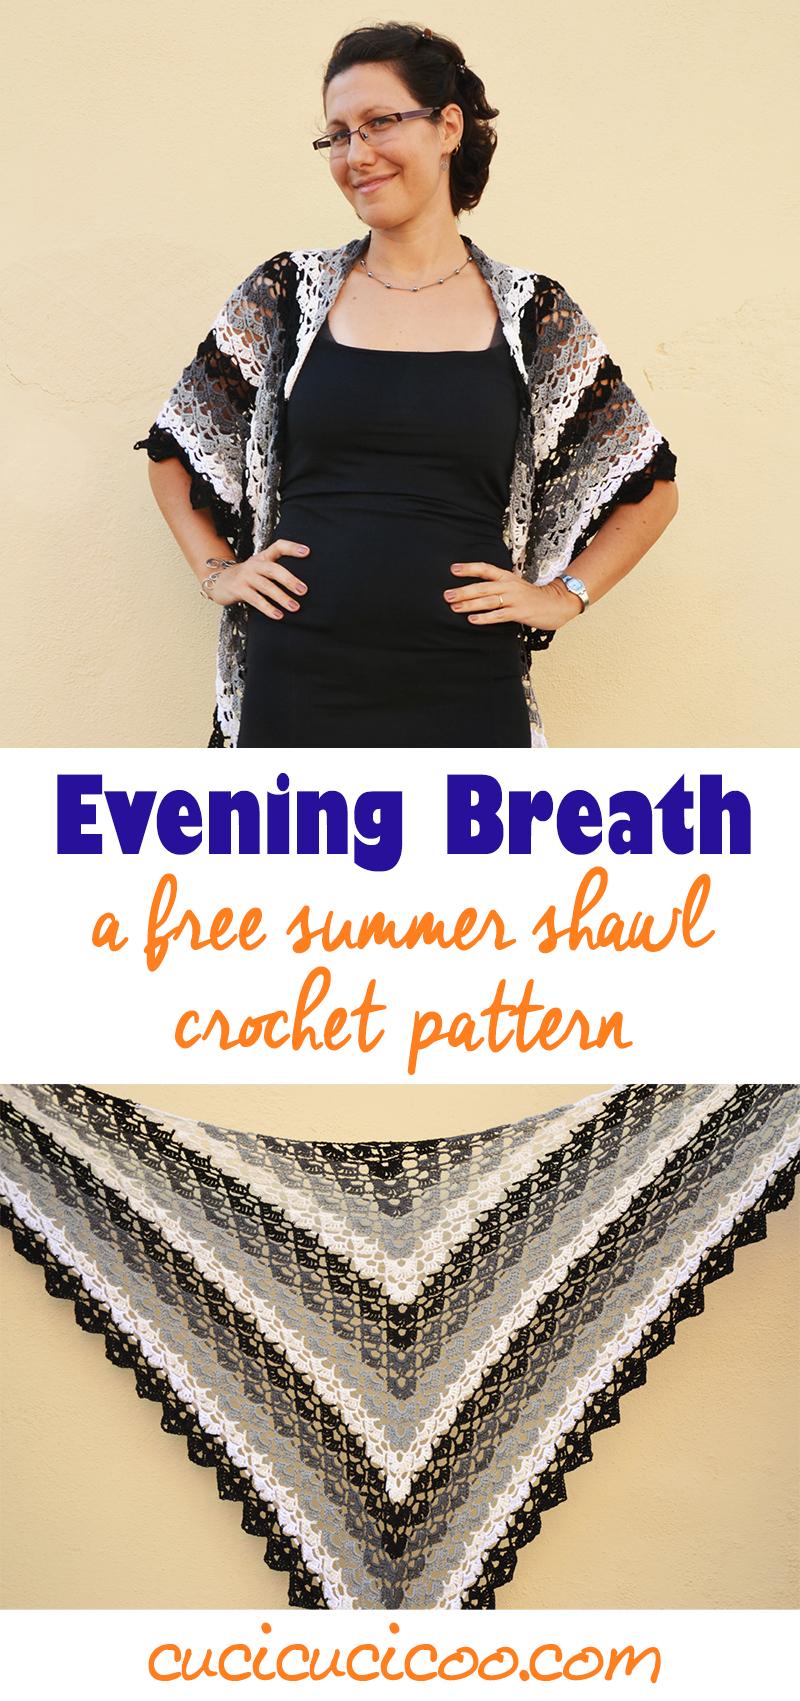 Evening Breath Free Summer Shawl Crochet Pattern Cucicucicoo